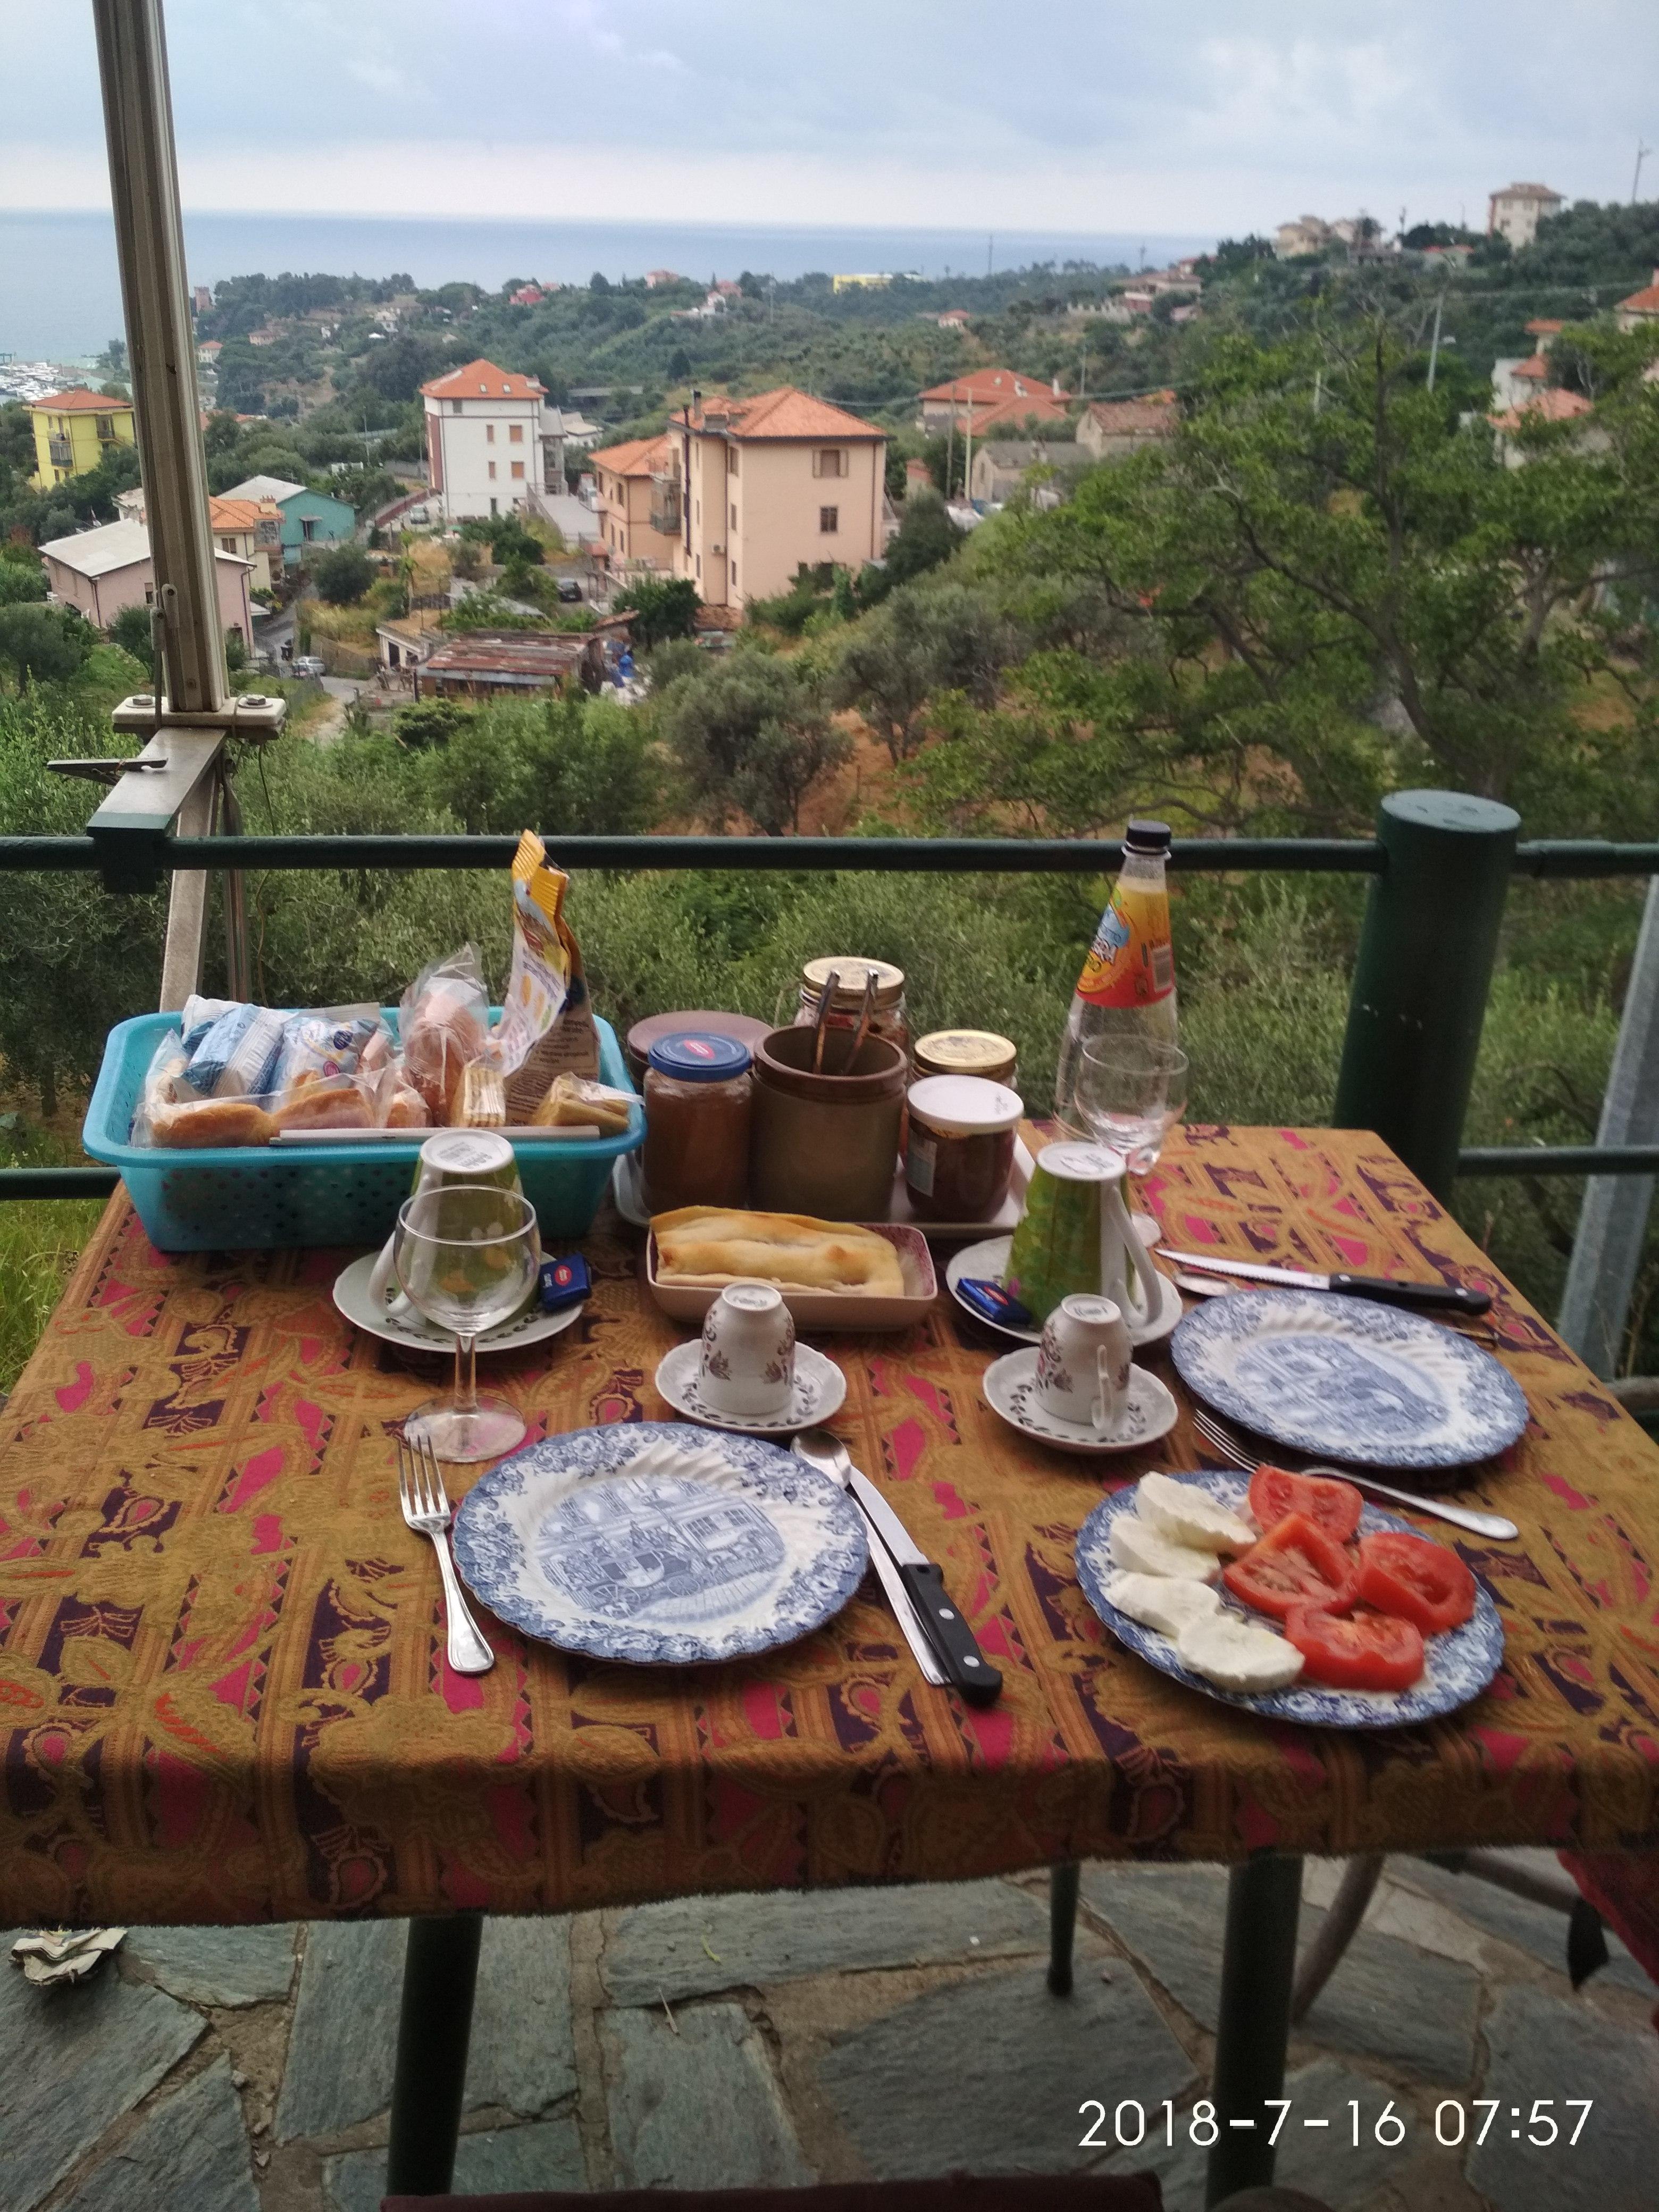 La Mia Cucina Varazze nadiuccia bed end breakfast - villas for rent in varazze